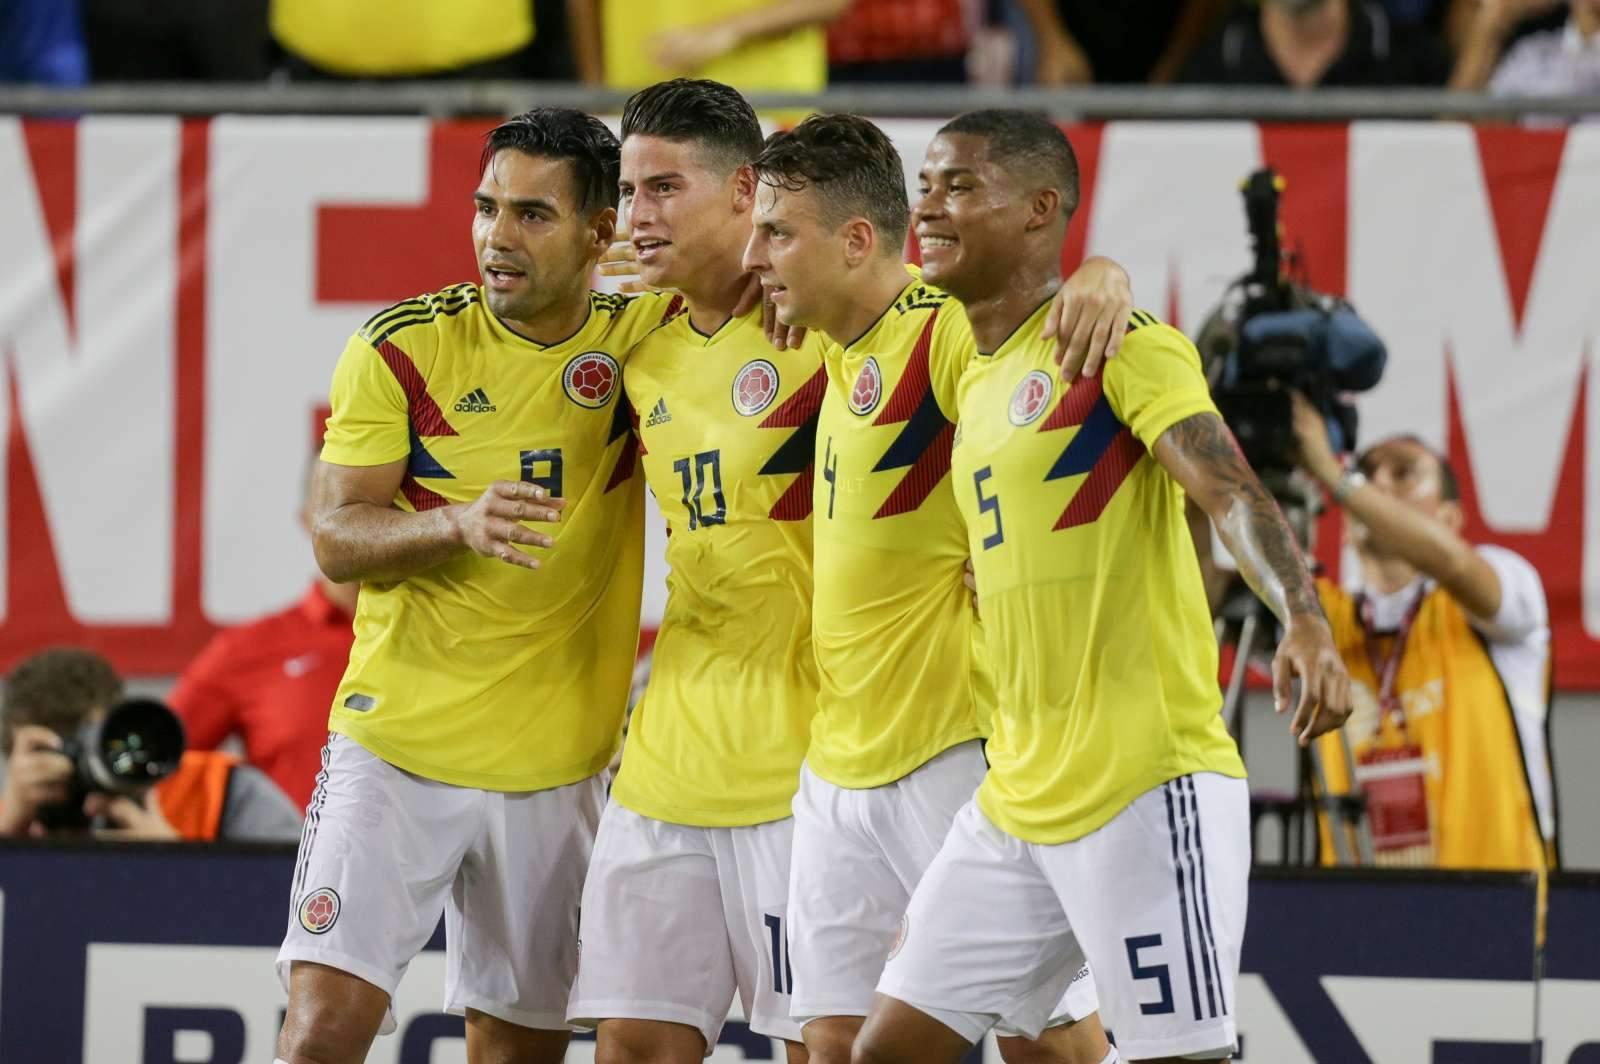 Колумбия – Чили: прогноз на матч отборочного цикла чемпионата мира-2022 - 10 сентября 2021